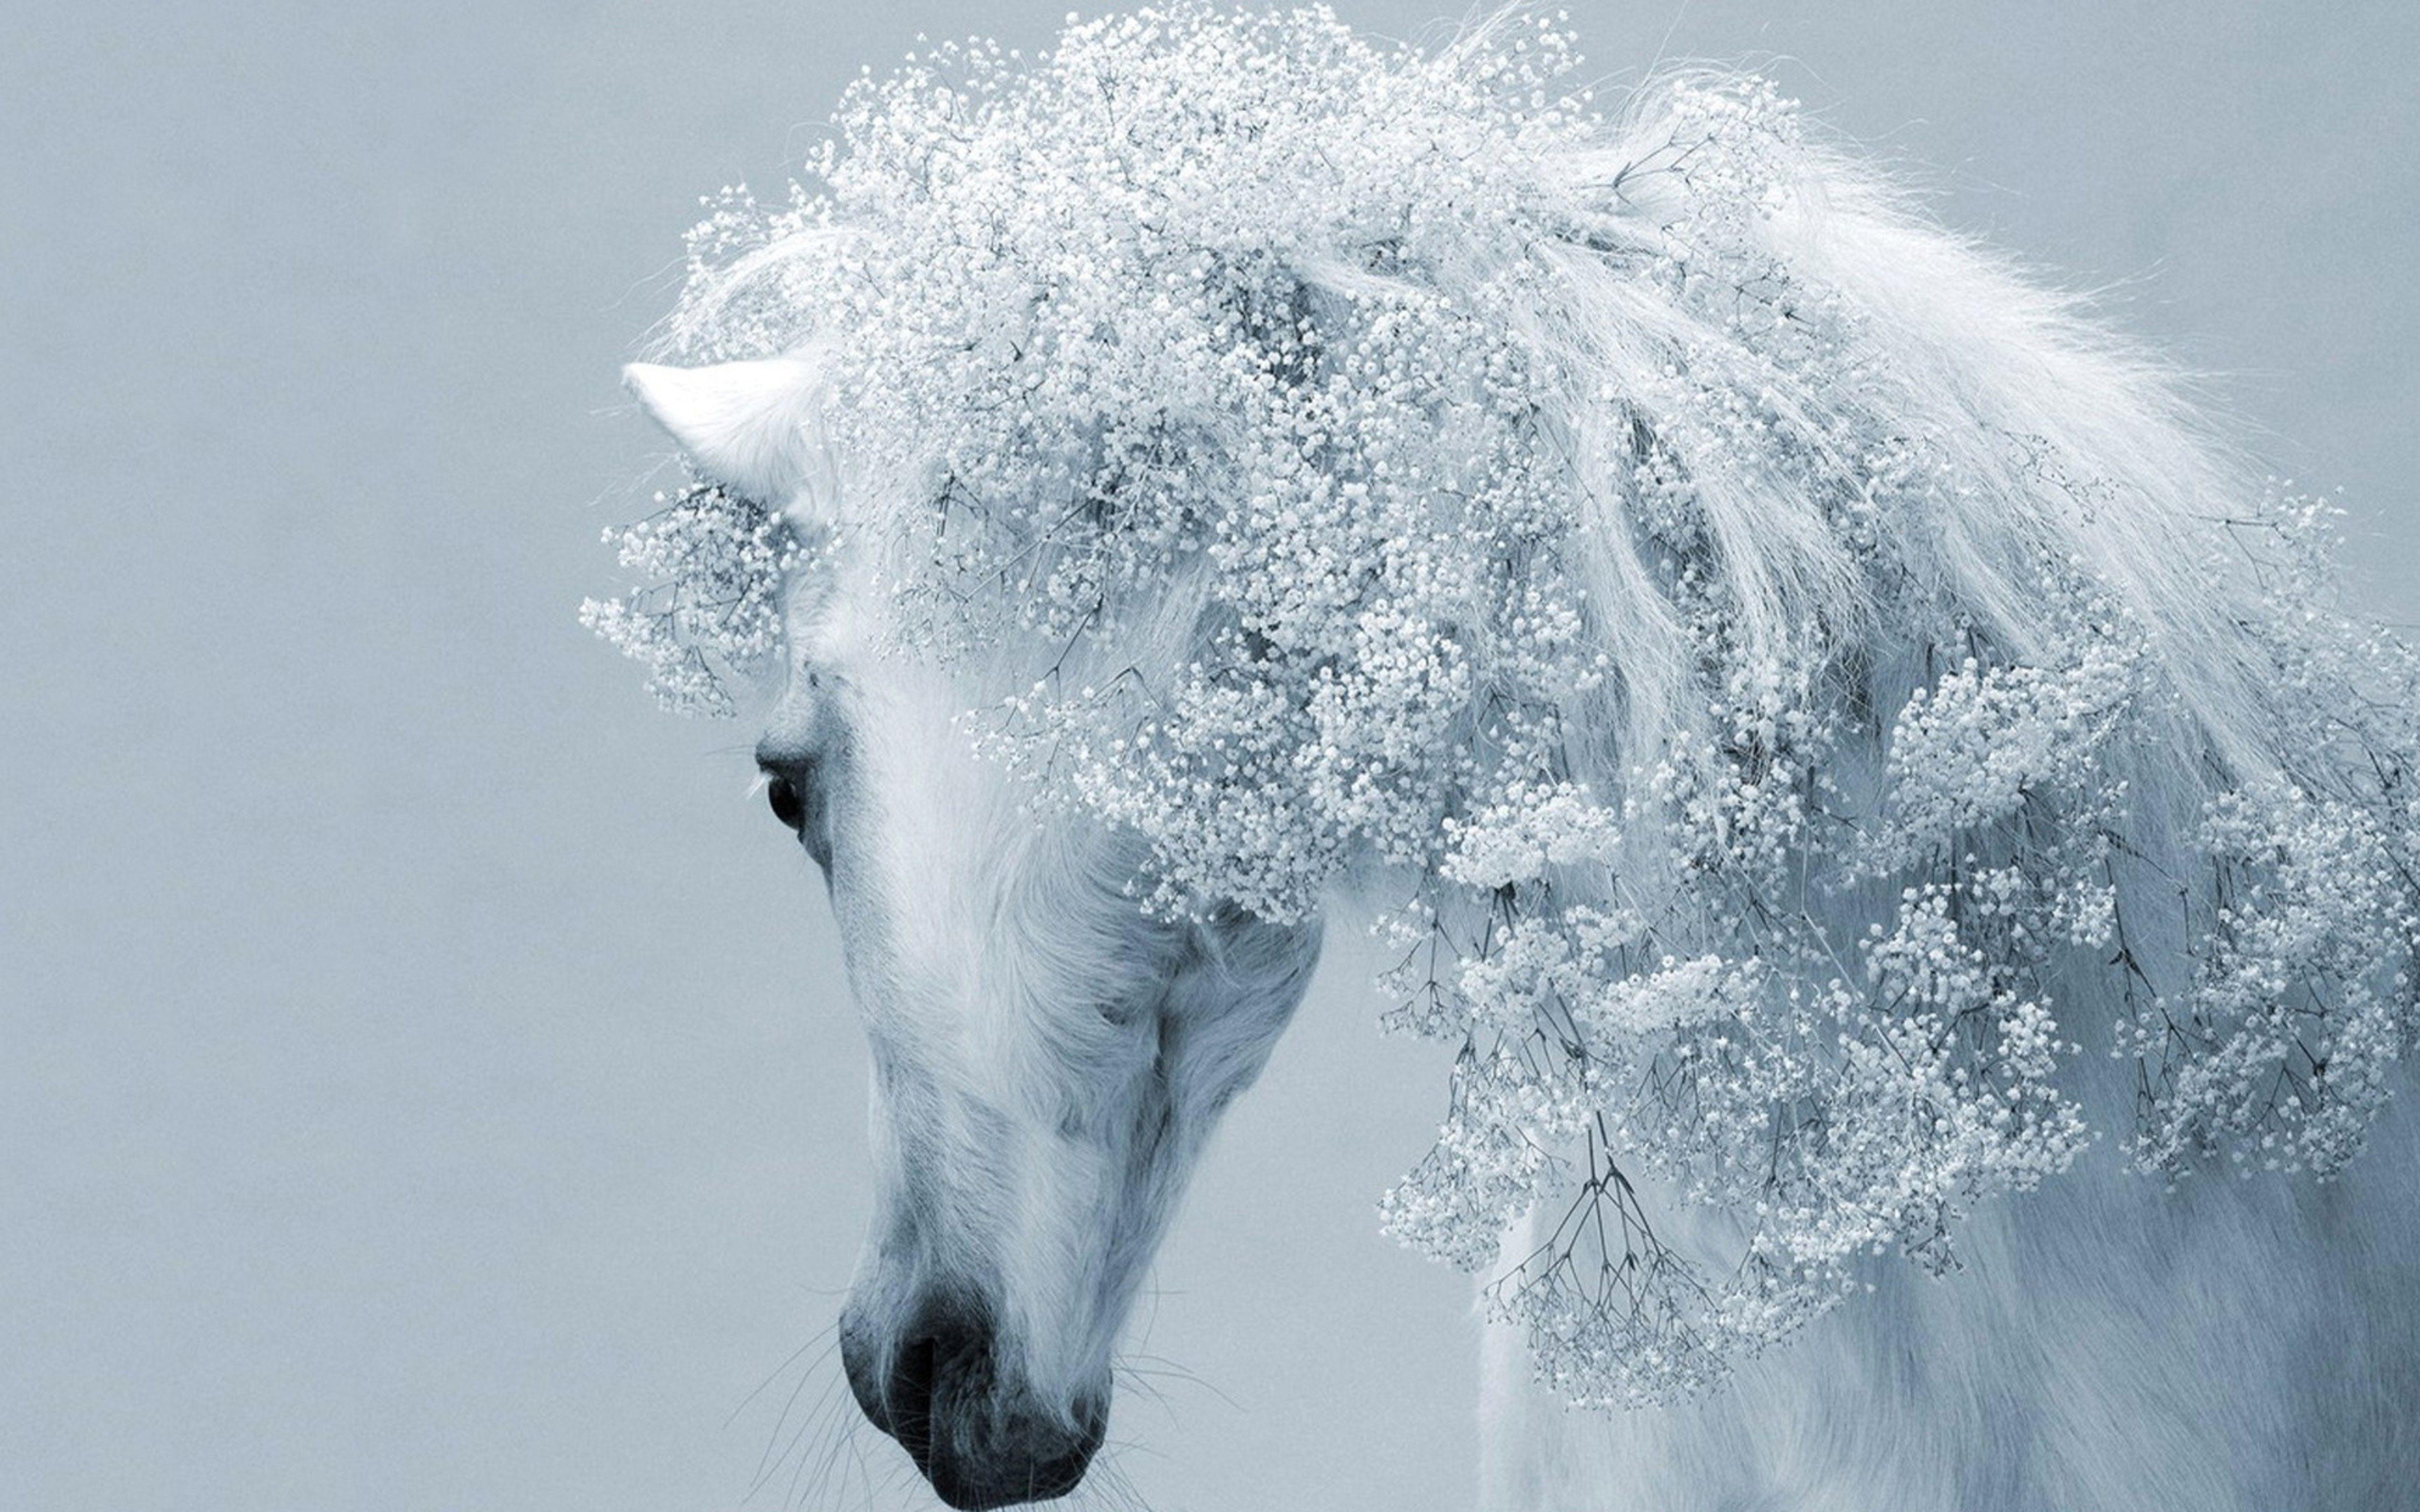 Wallpaper Download 5120x3200 Fantasy White Horse Fantastic Horse Hair Horses Wallpapers Animals Wallpapers Downloa Horse Wallpaper Beautiful Horses Horses